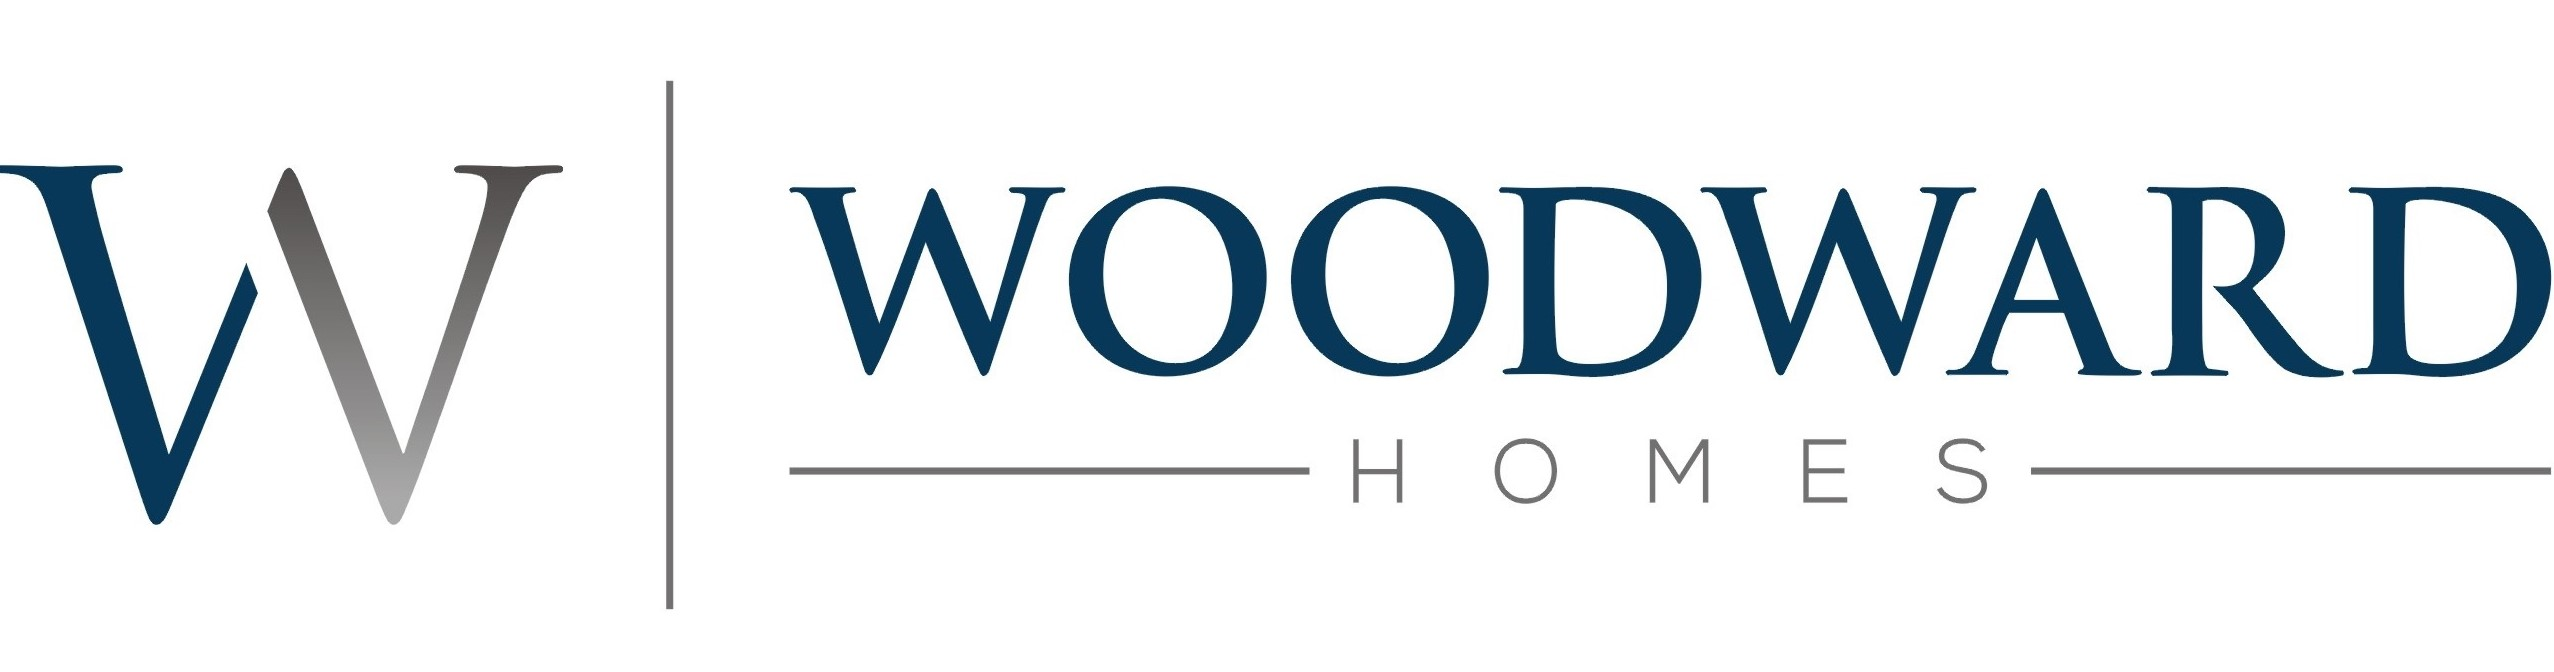 Woodward Homes logo